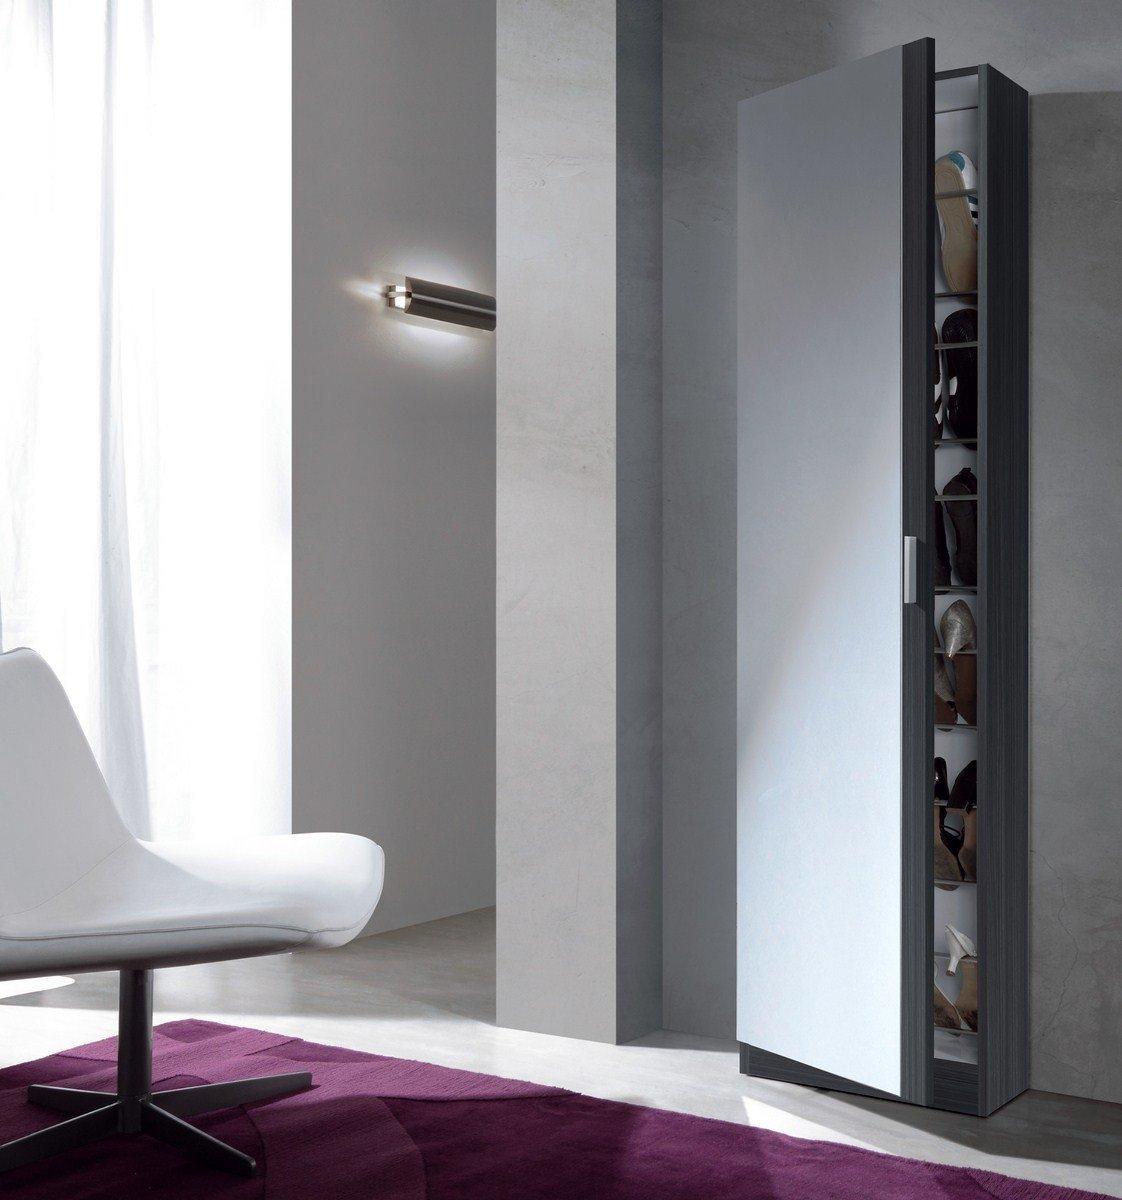 Mueble zapatero con puerta cristal espejo armario for Mueble zapatero gris